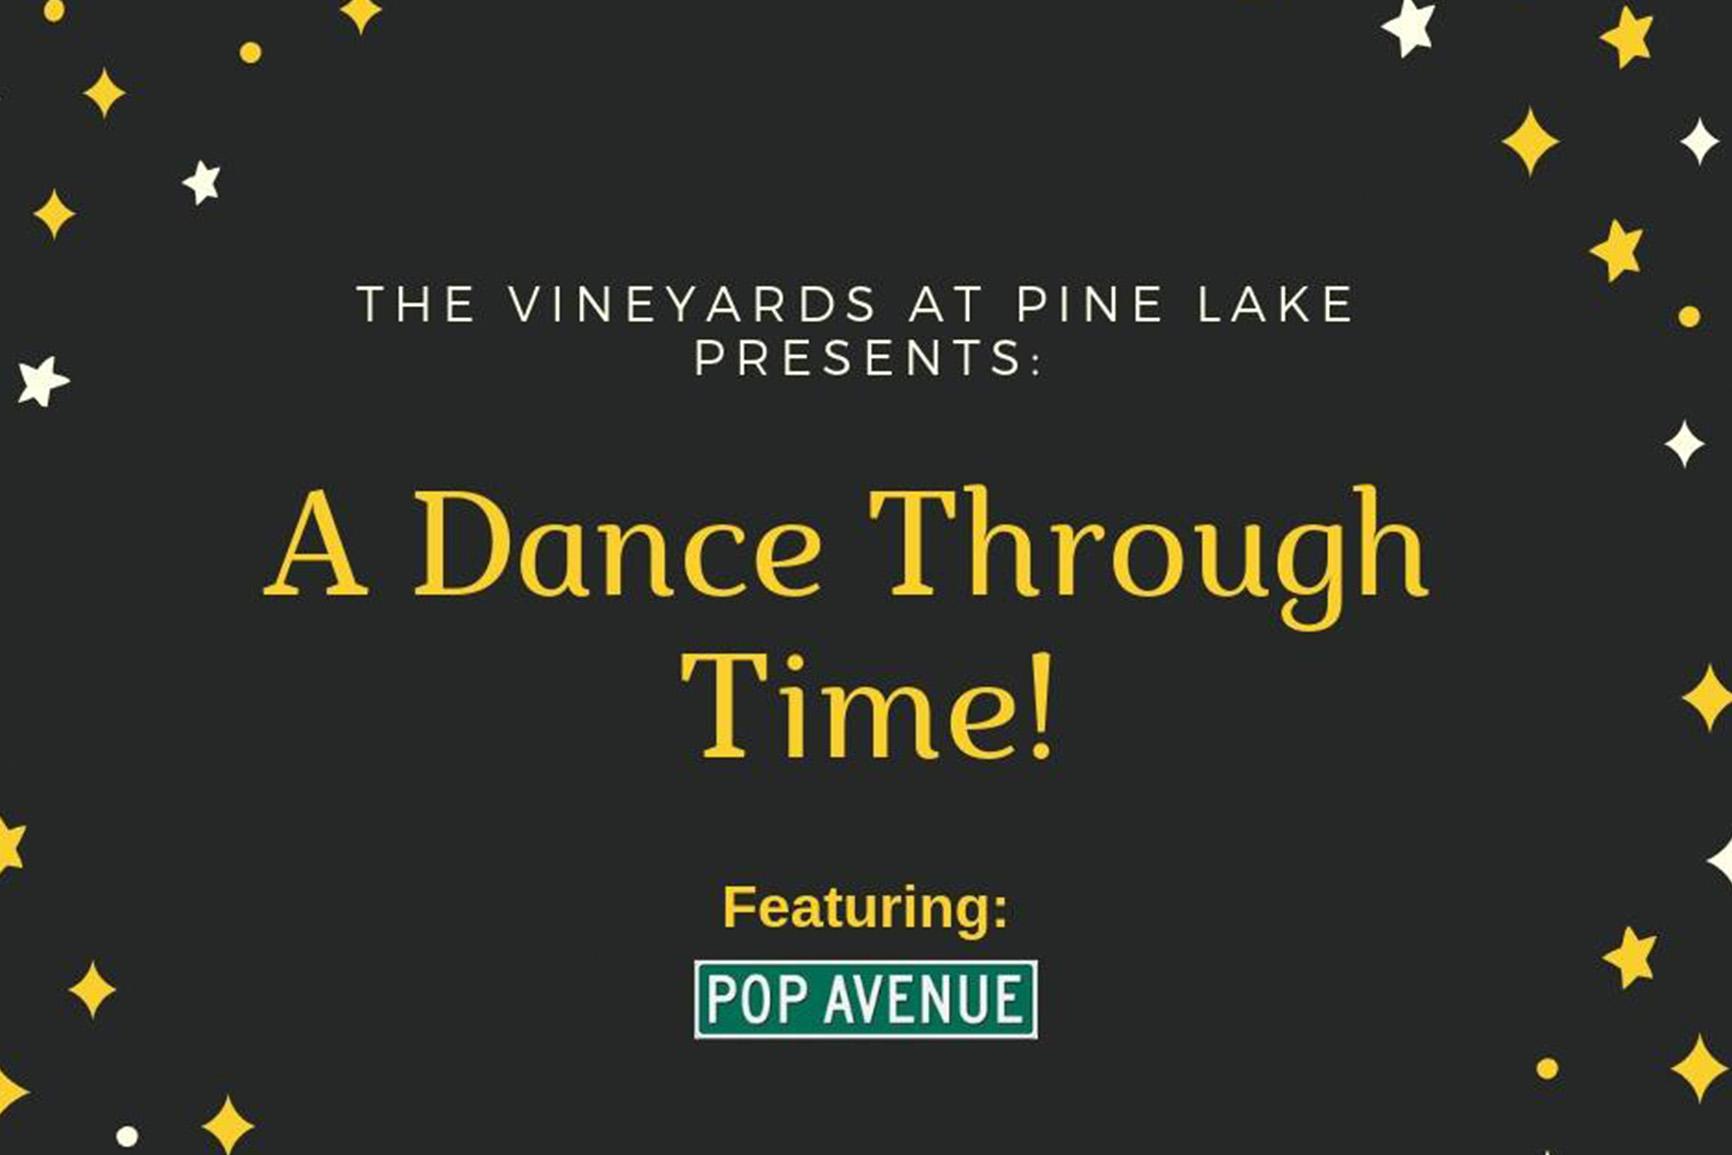 A Dance Through Time